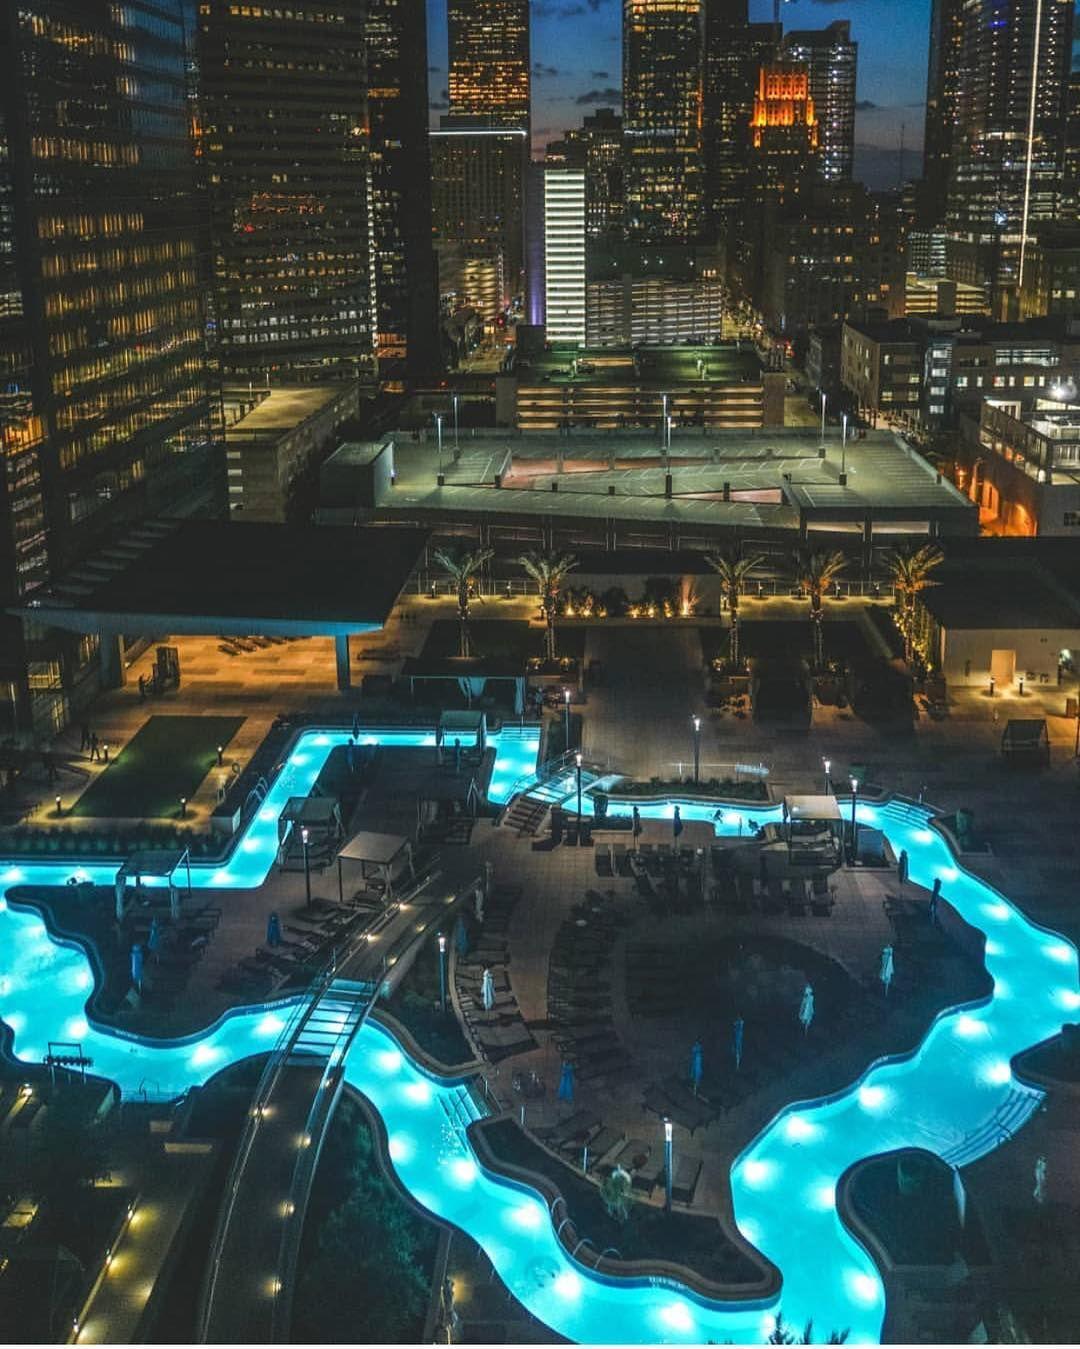 900 Stores Resturants And Stuff Ideas Nightclub Design Houston Travel Explore Houston